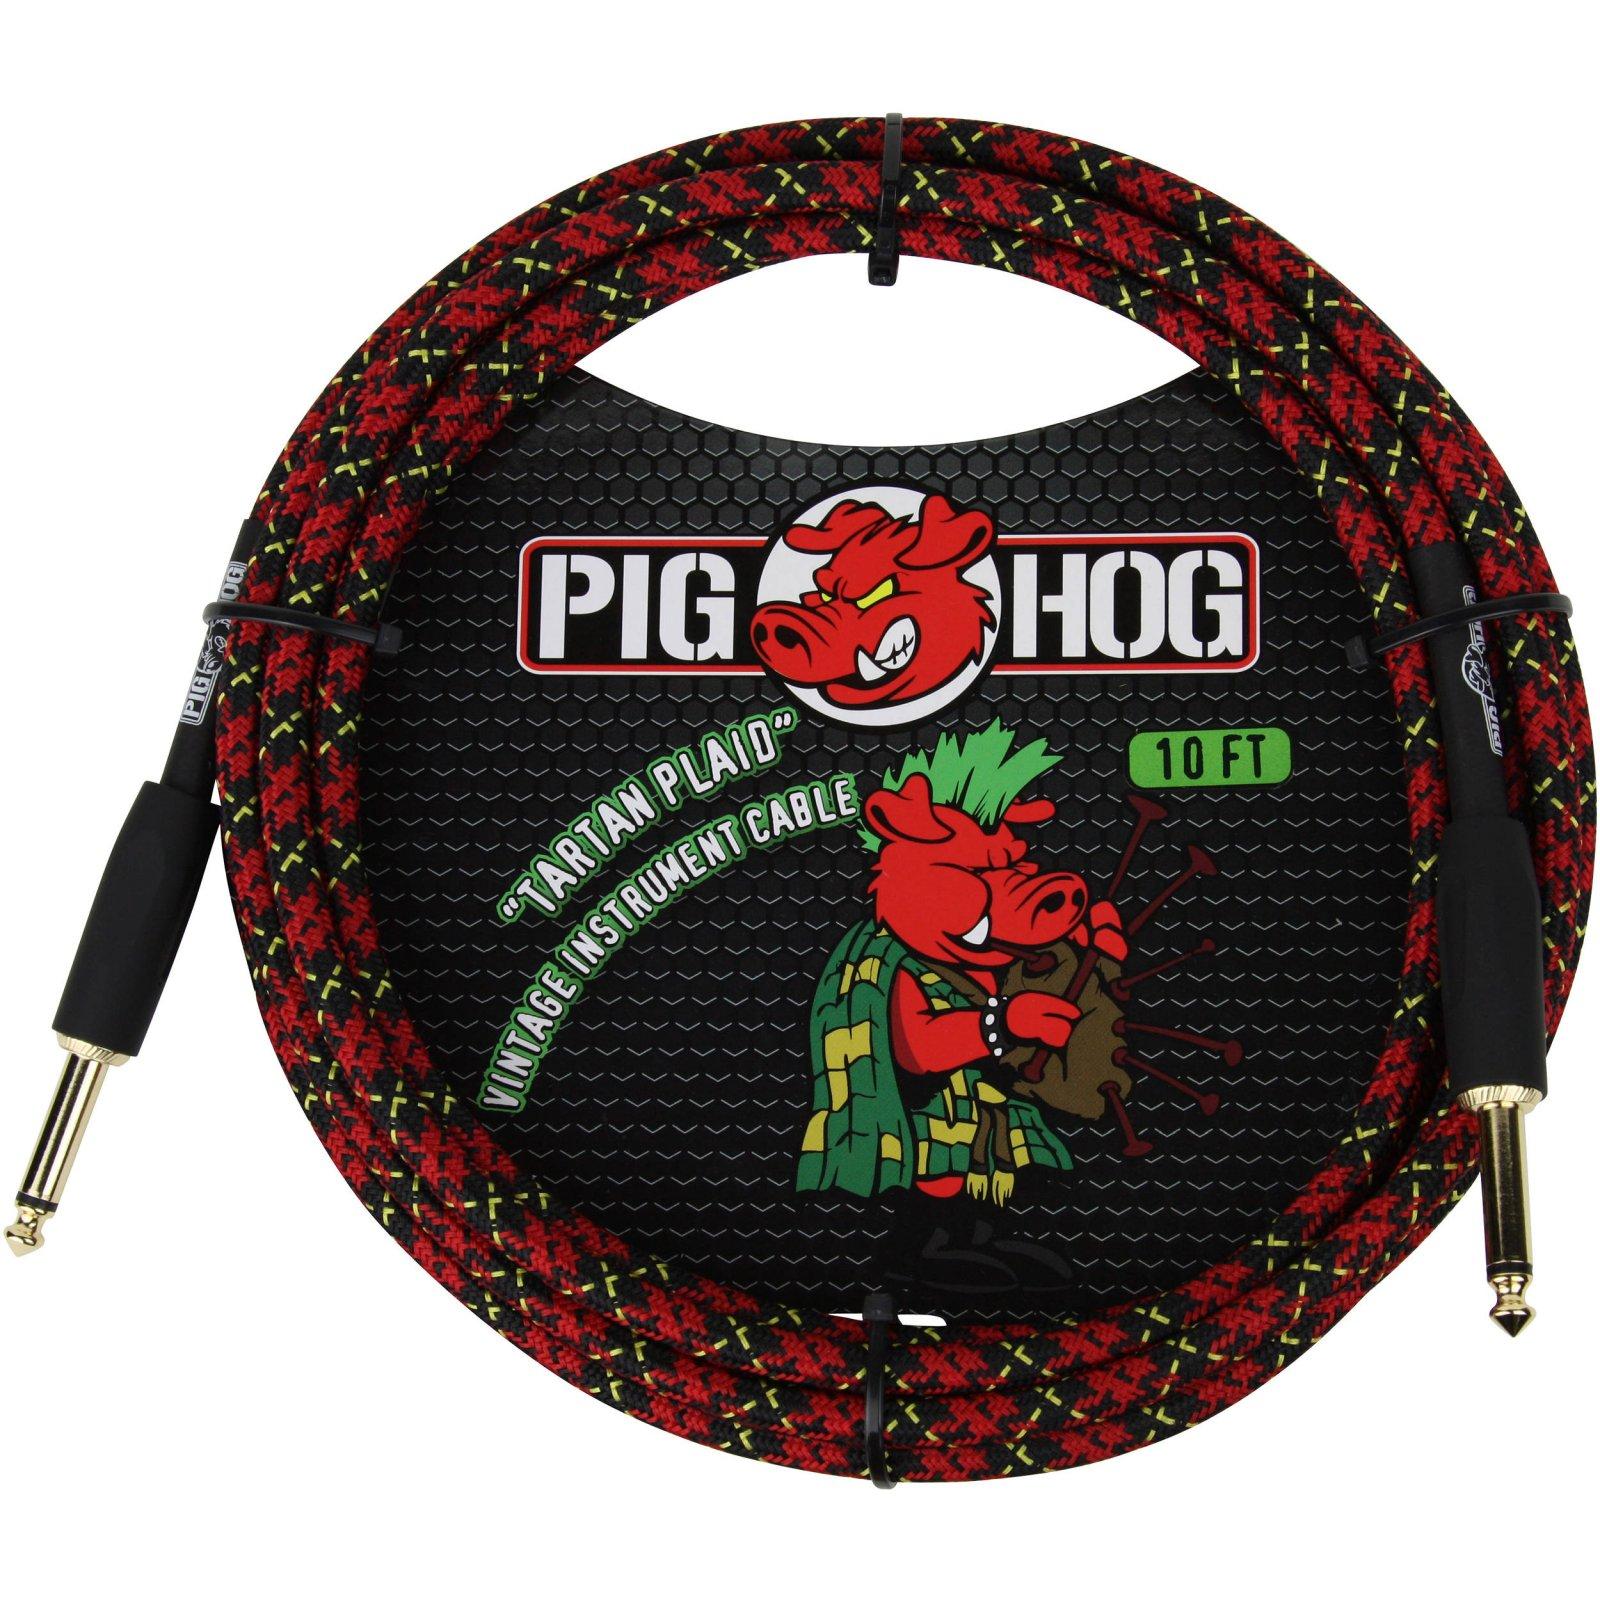 Pig Hog 10ft Tartan Plaid Cable